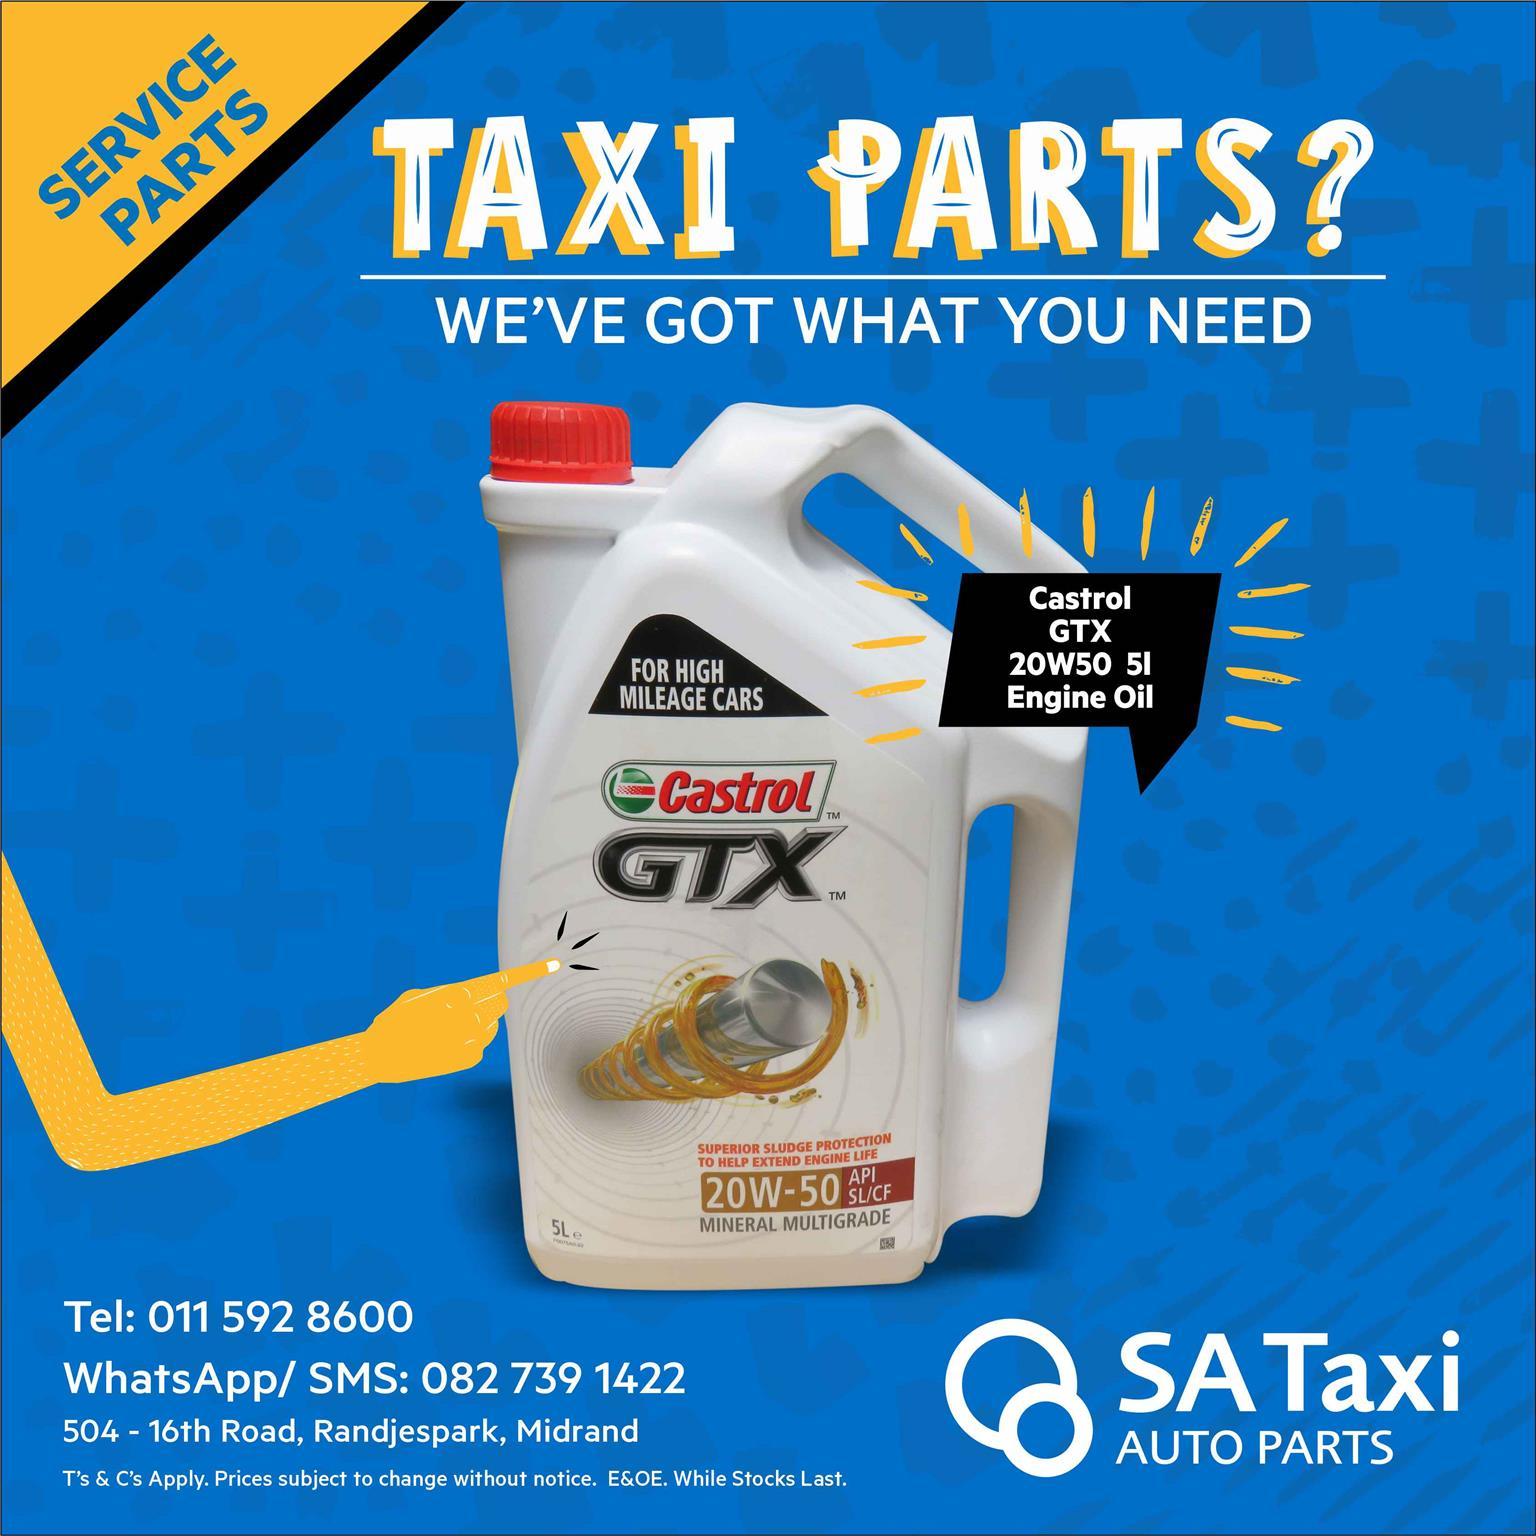 Castrol GTX 20W50 5l Engine Oil - SA Taxi Auto Parts quality service parts